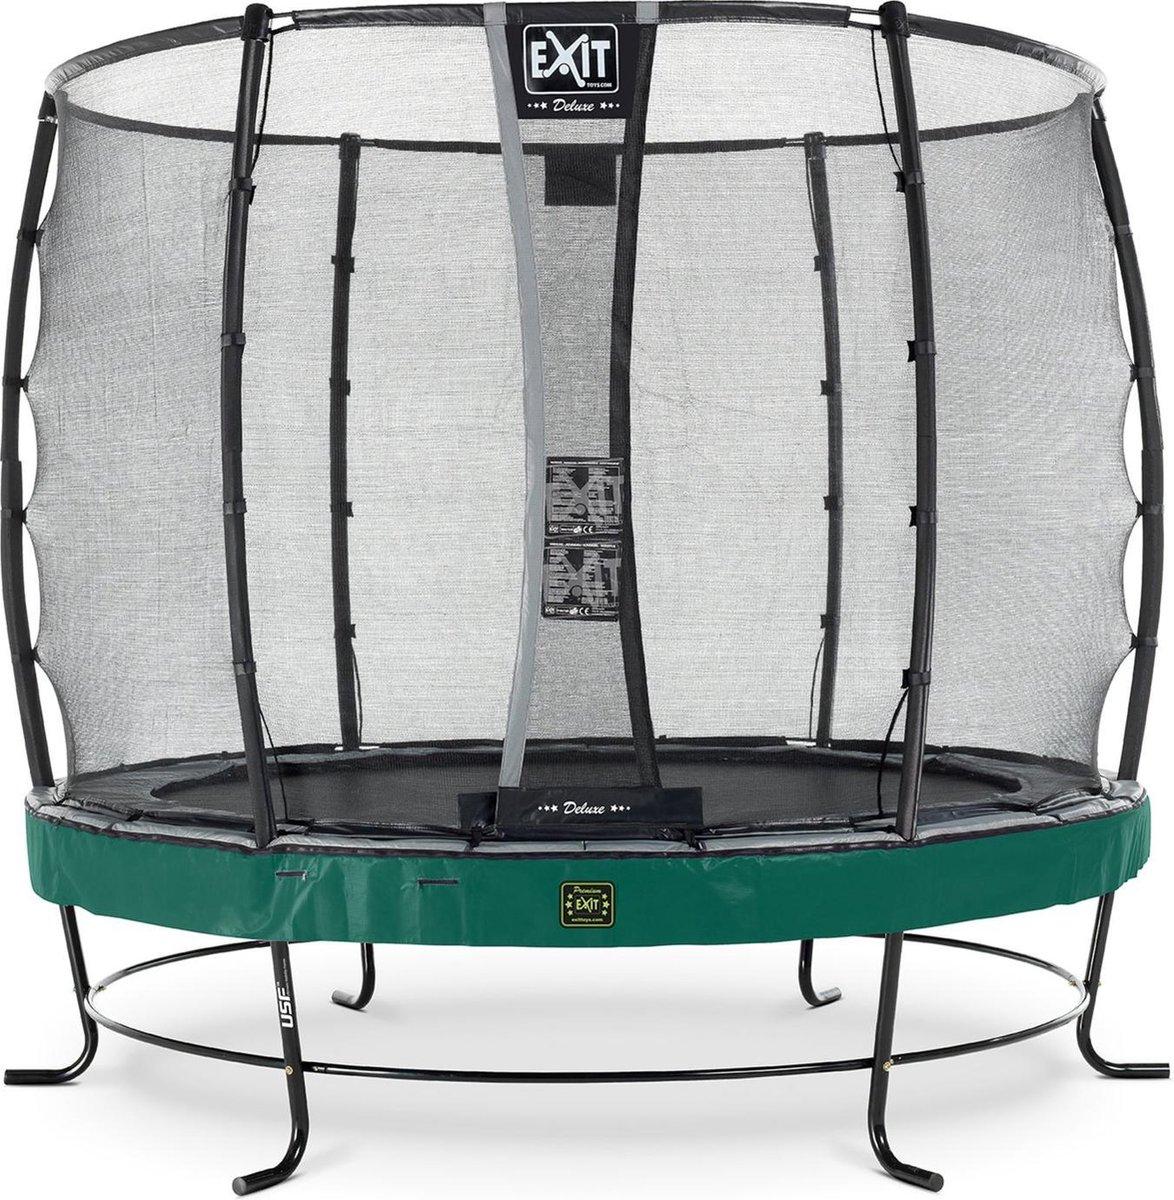 Trampoline EXIT Elegant Premium - ø253cm + net Deluxe - groen